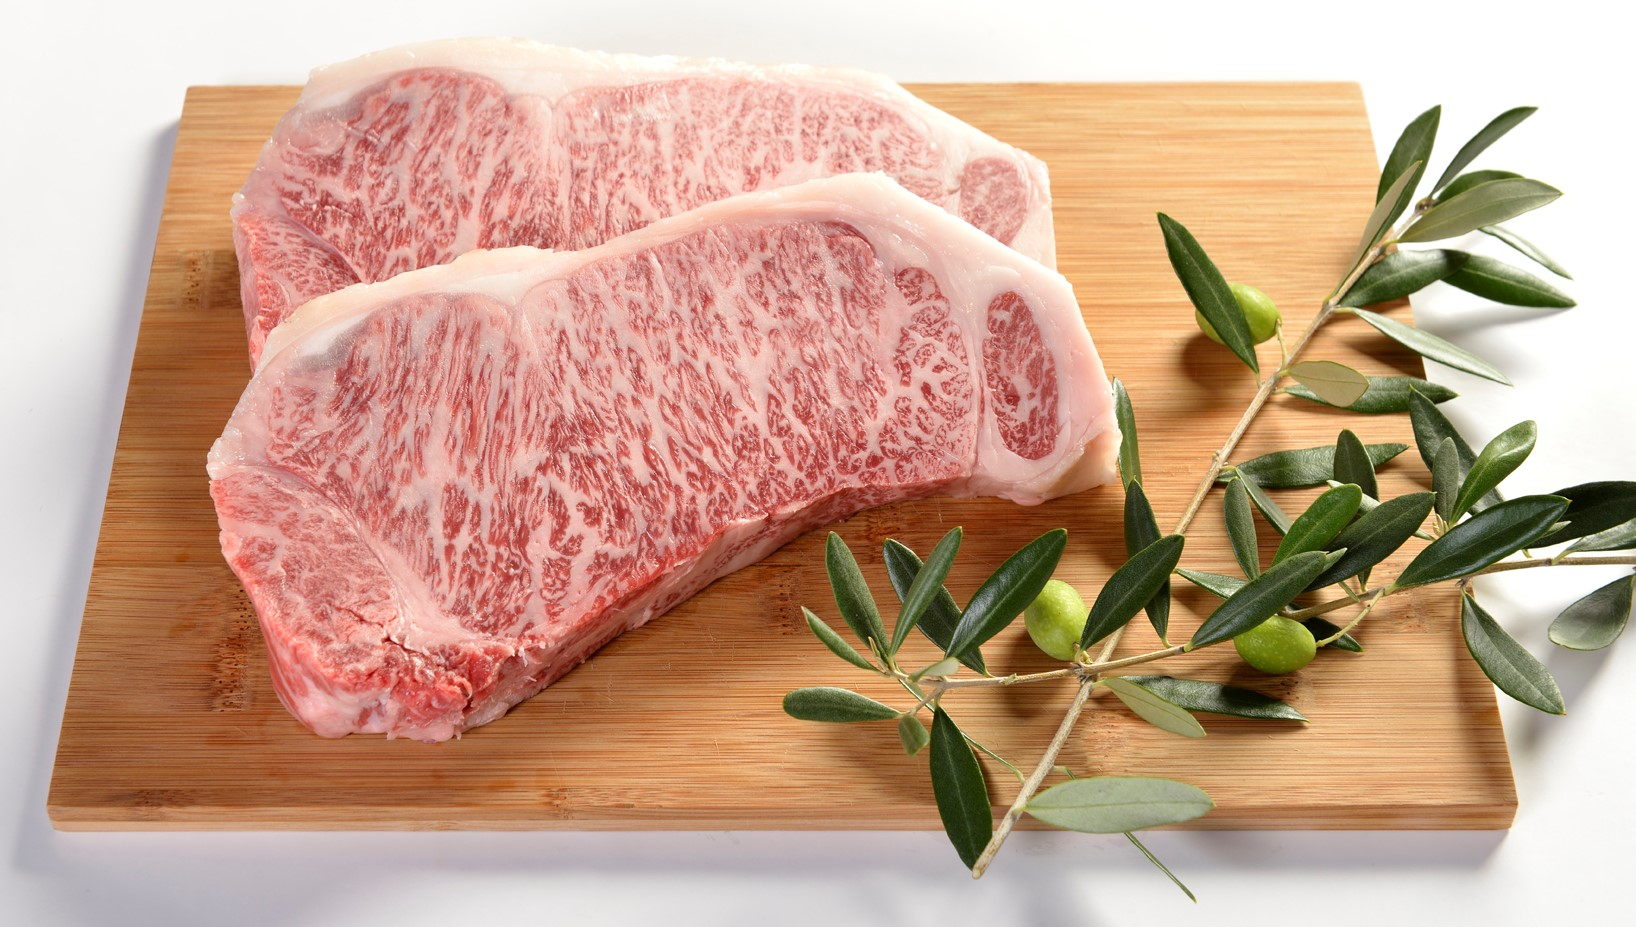 Olive-fed Wagyu beef.